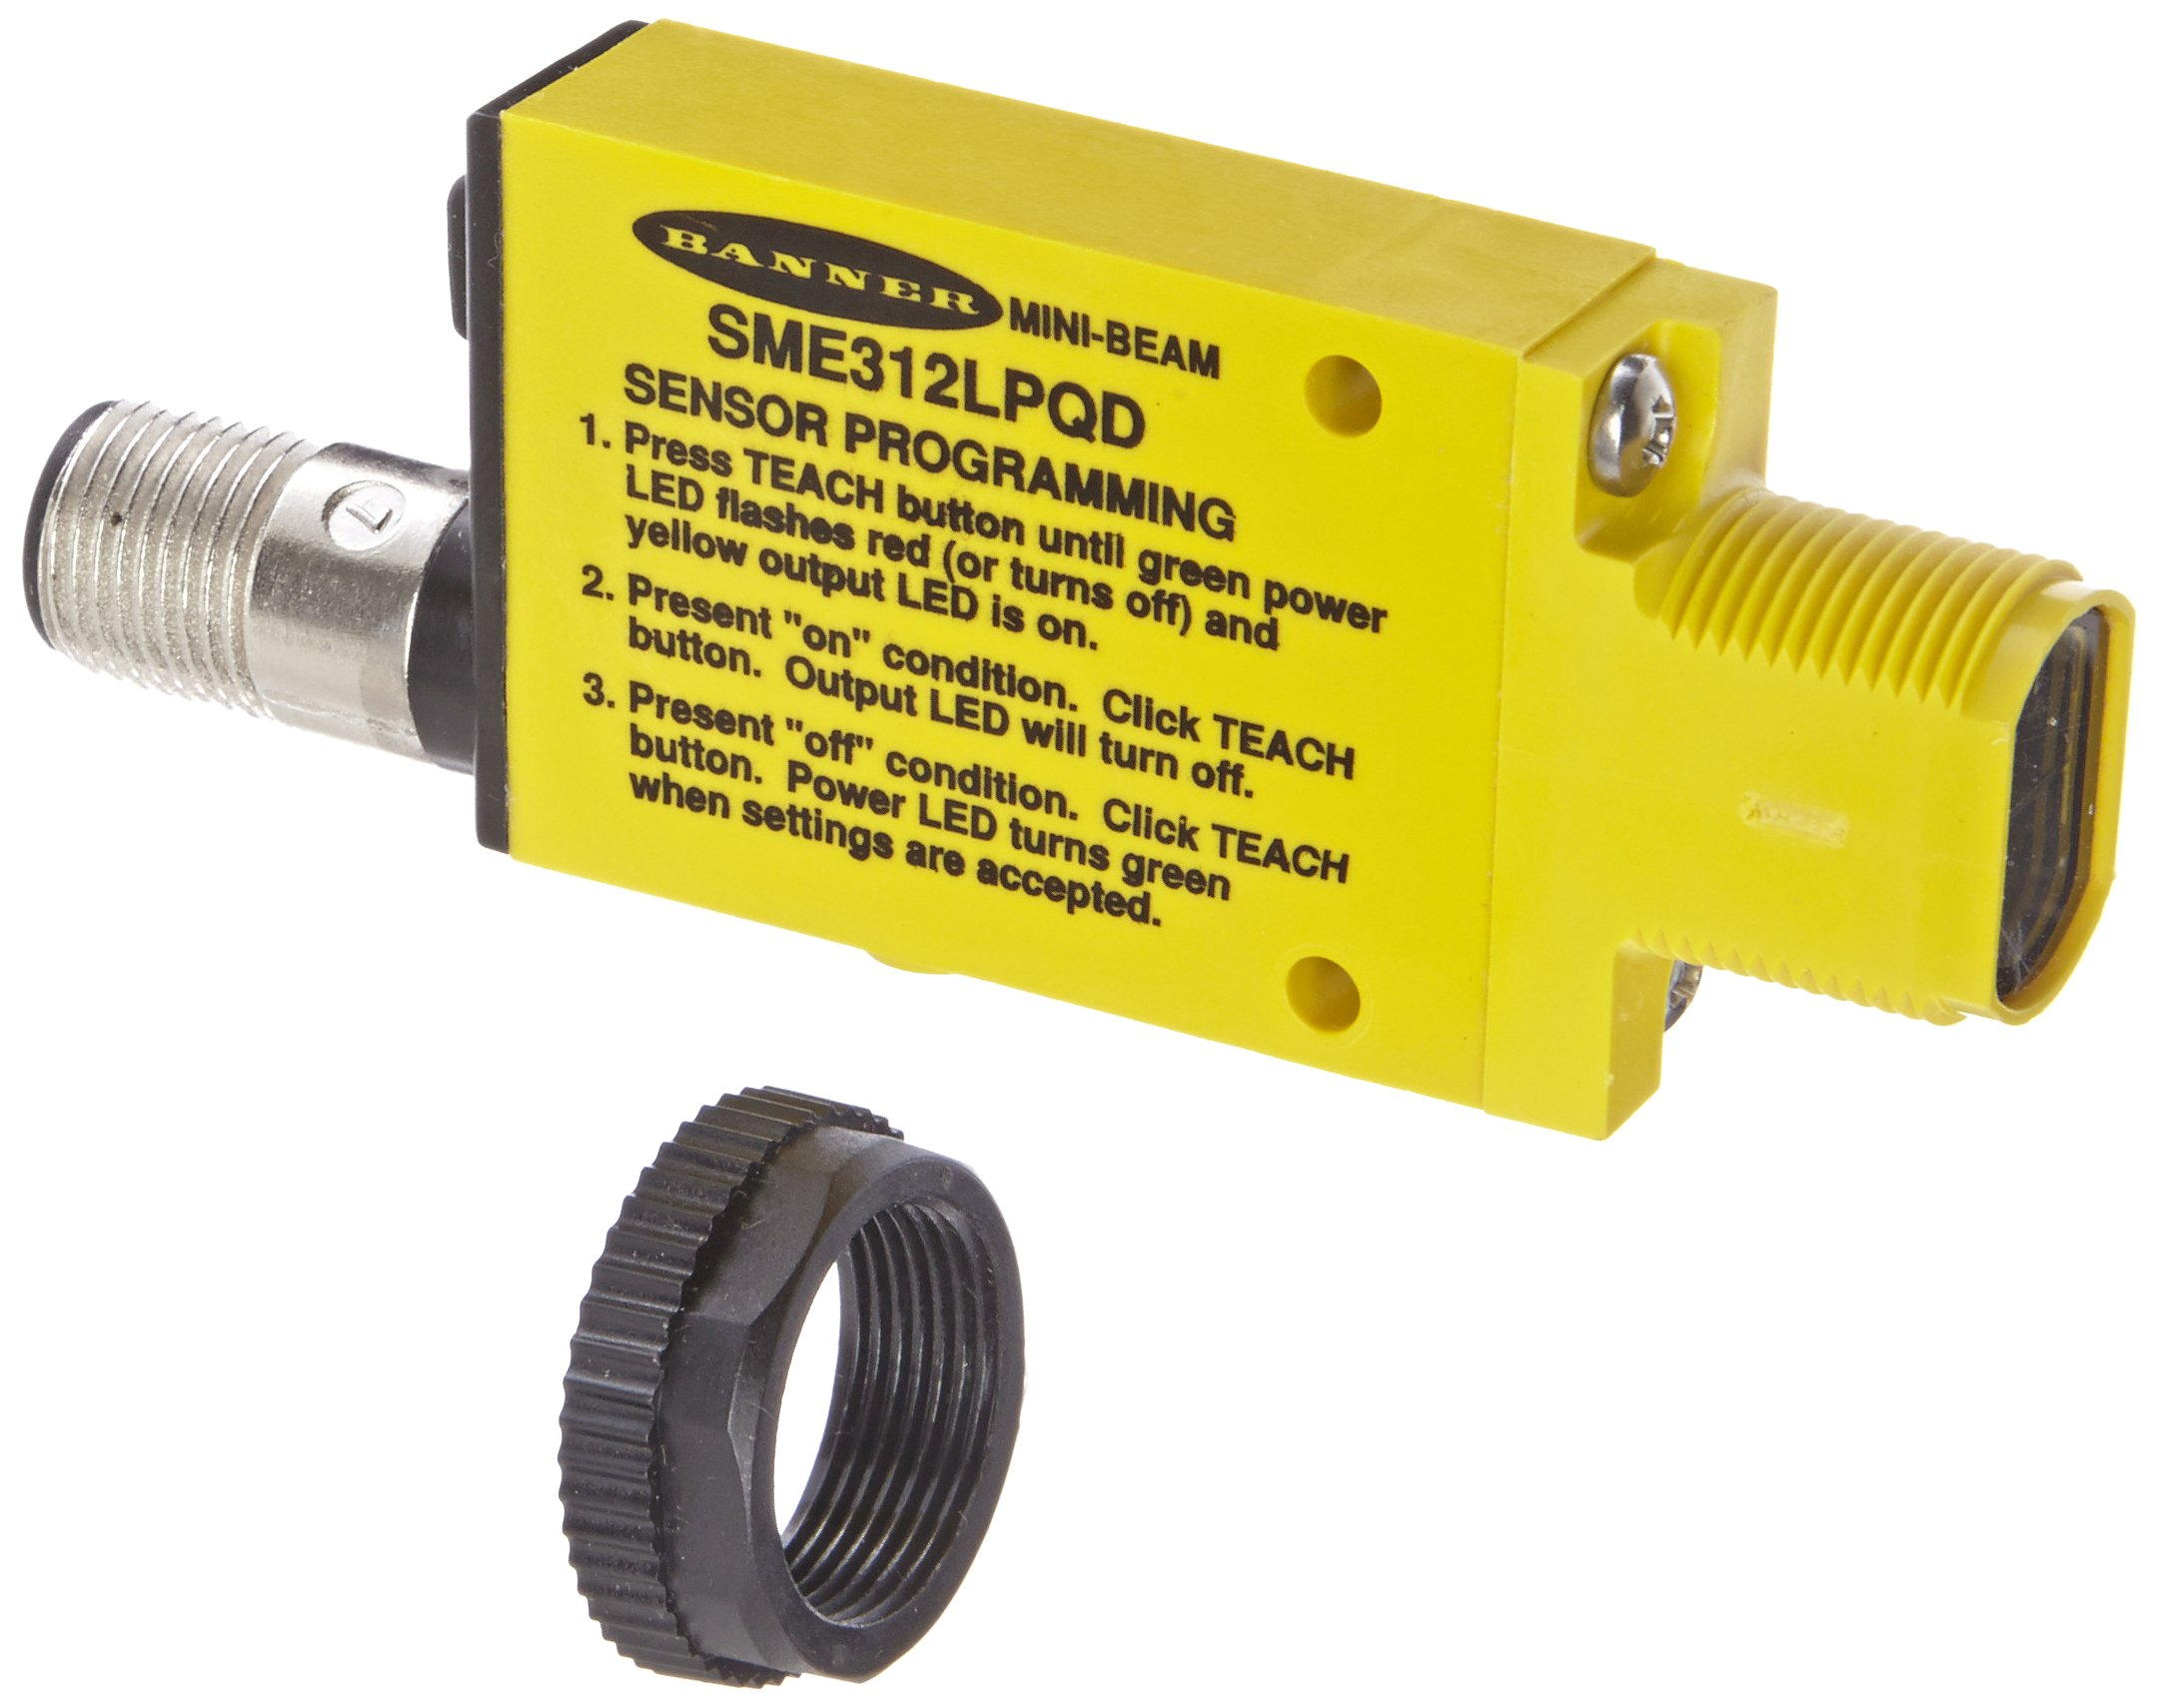 Banner SME312LPQD Mini Beam Expert Sensor, Polarized-Retroreflective Sensing Mode, 5-pin Euro-Style QD Connector, Visible Red LED, 10-30 VDC Supply Voltage, Bipolar (NPN and PNP) Output, 3 m Sensing Range